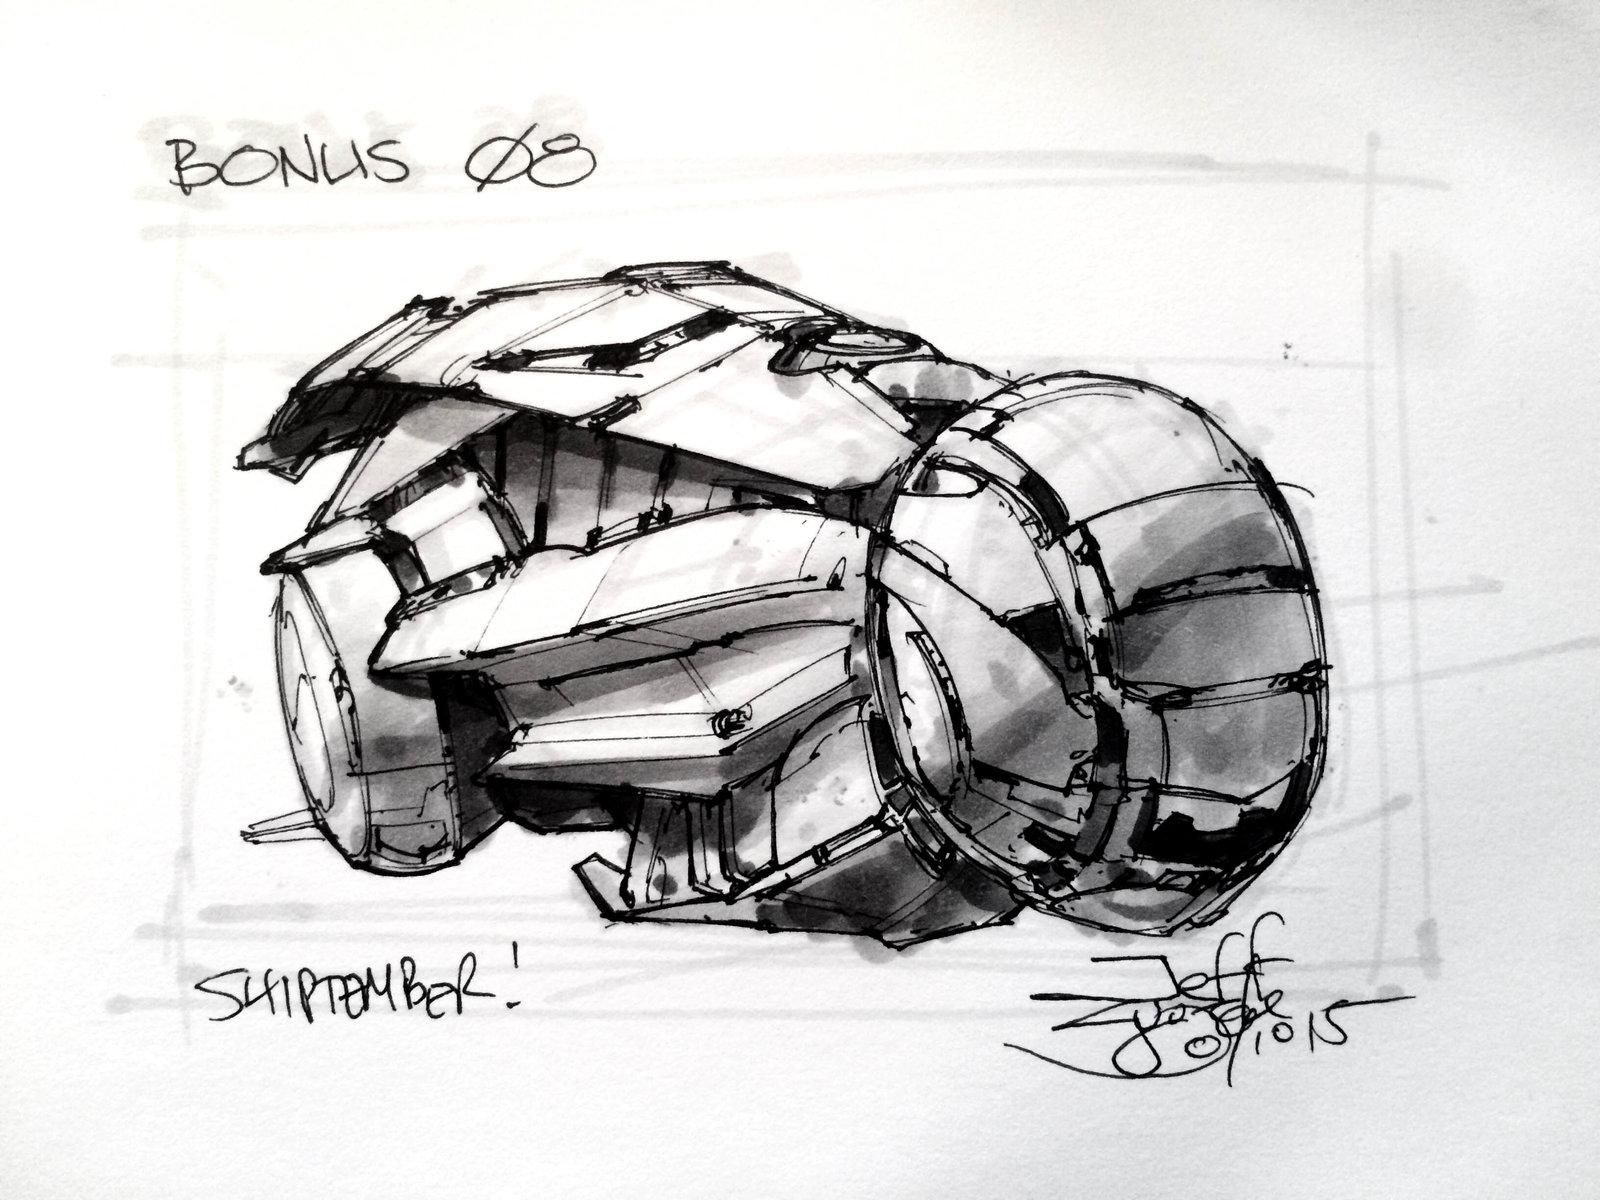 Shiptember Bonus 08